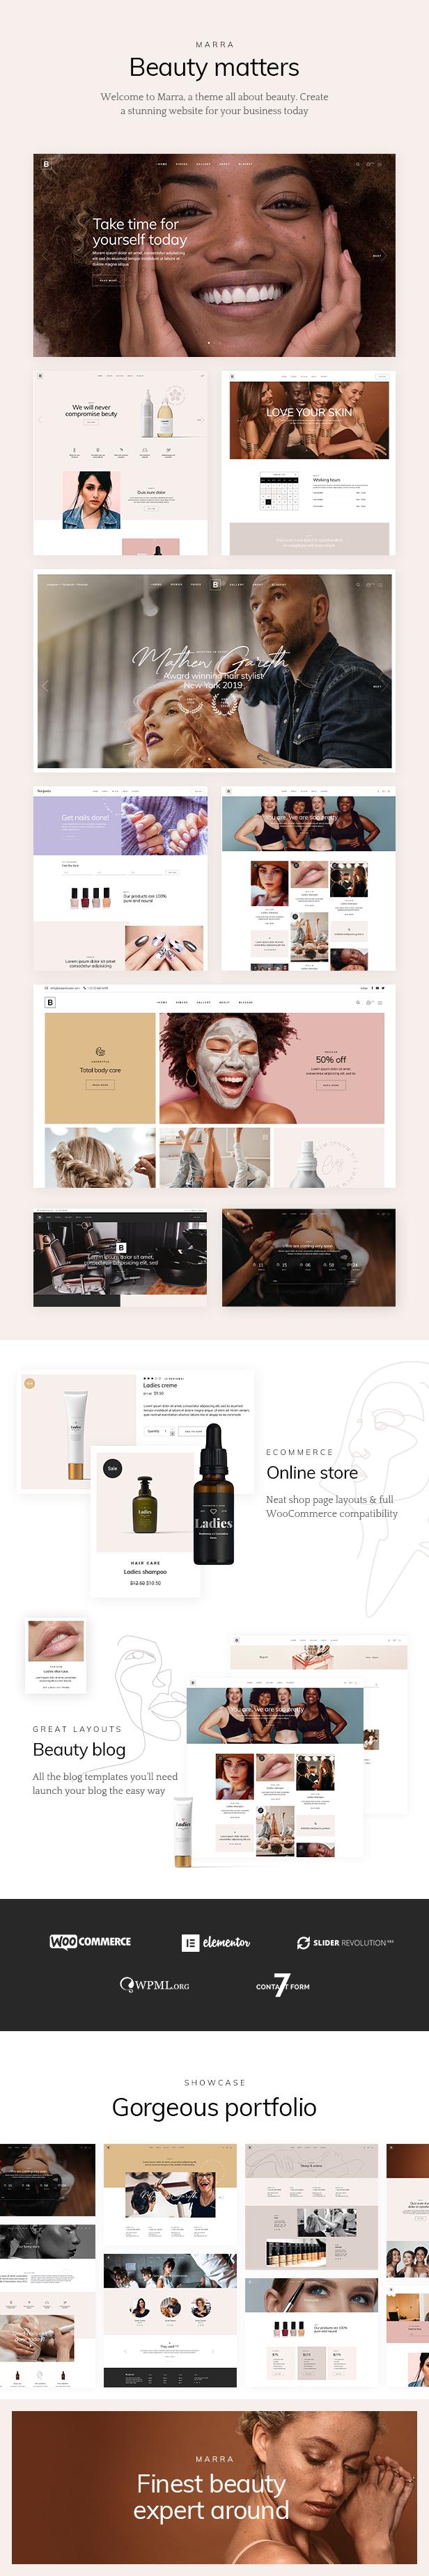 Marra - Beauty WordPress Theme - 2